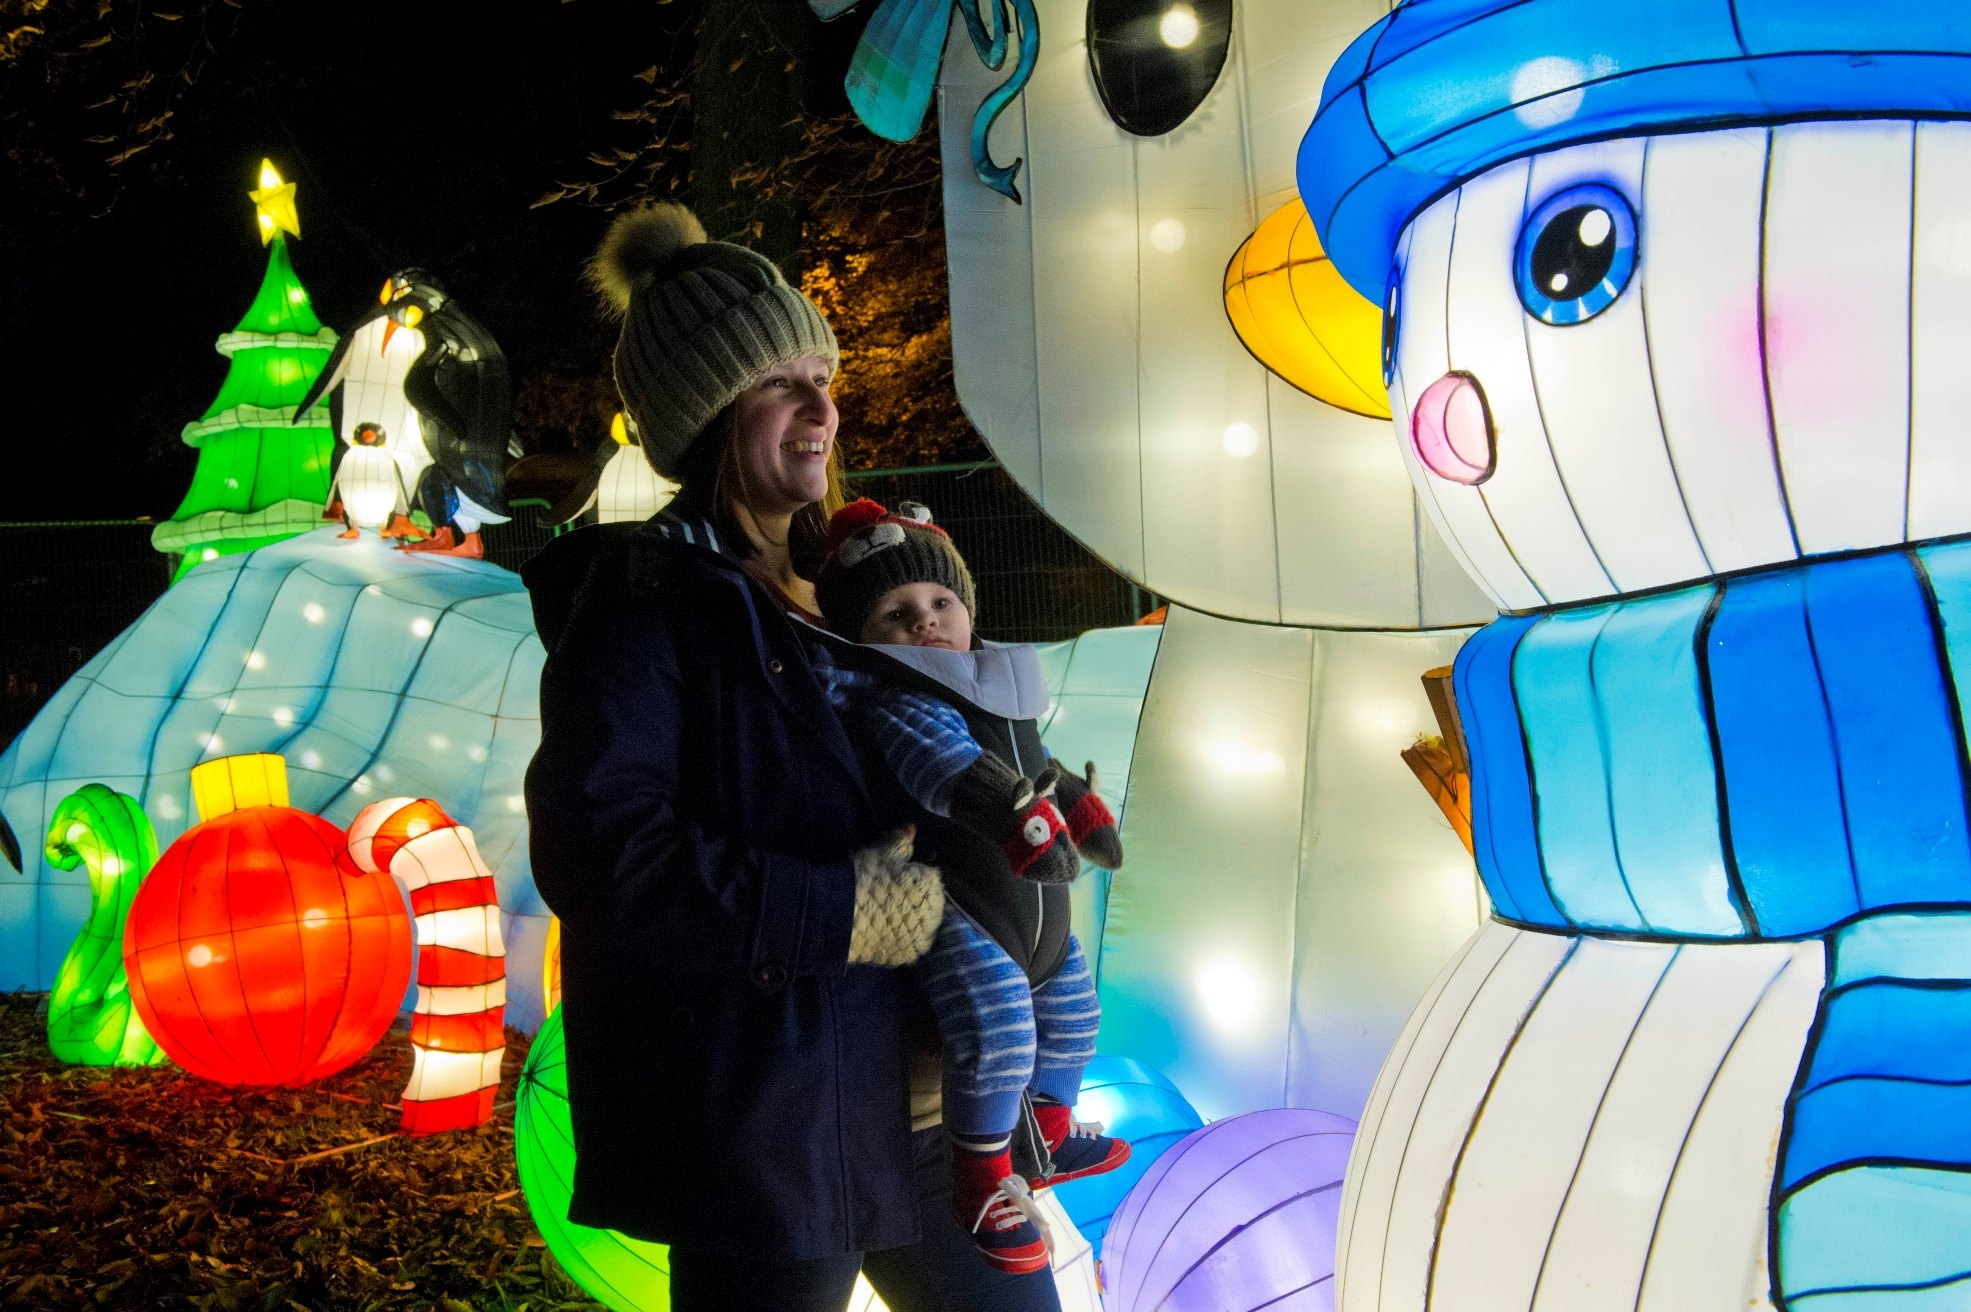 Magical Lanterns Festival, Roundhay Park, Leeds.Photograph by Richard Walker / www.imagenorth.net